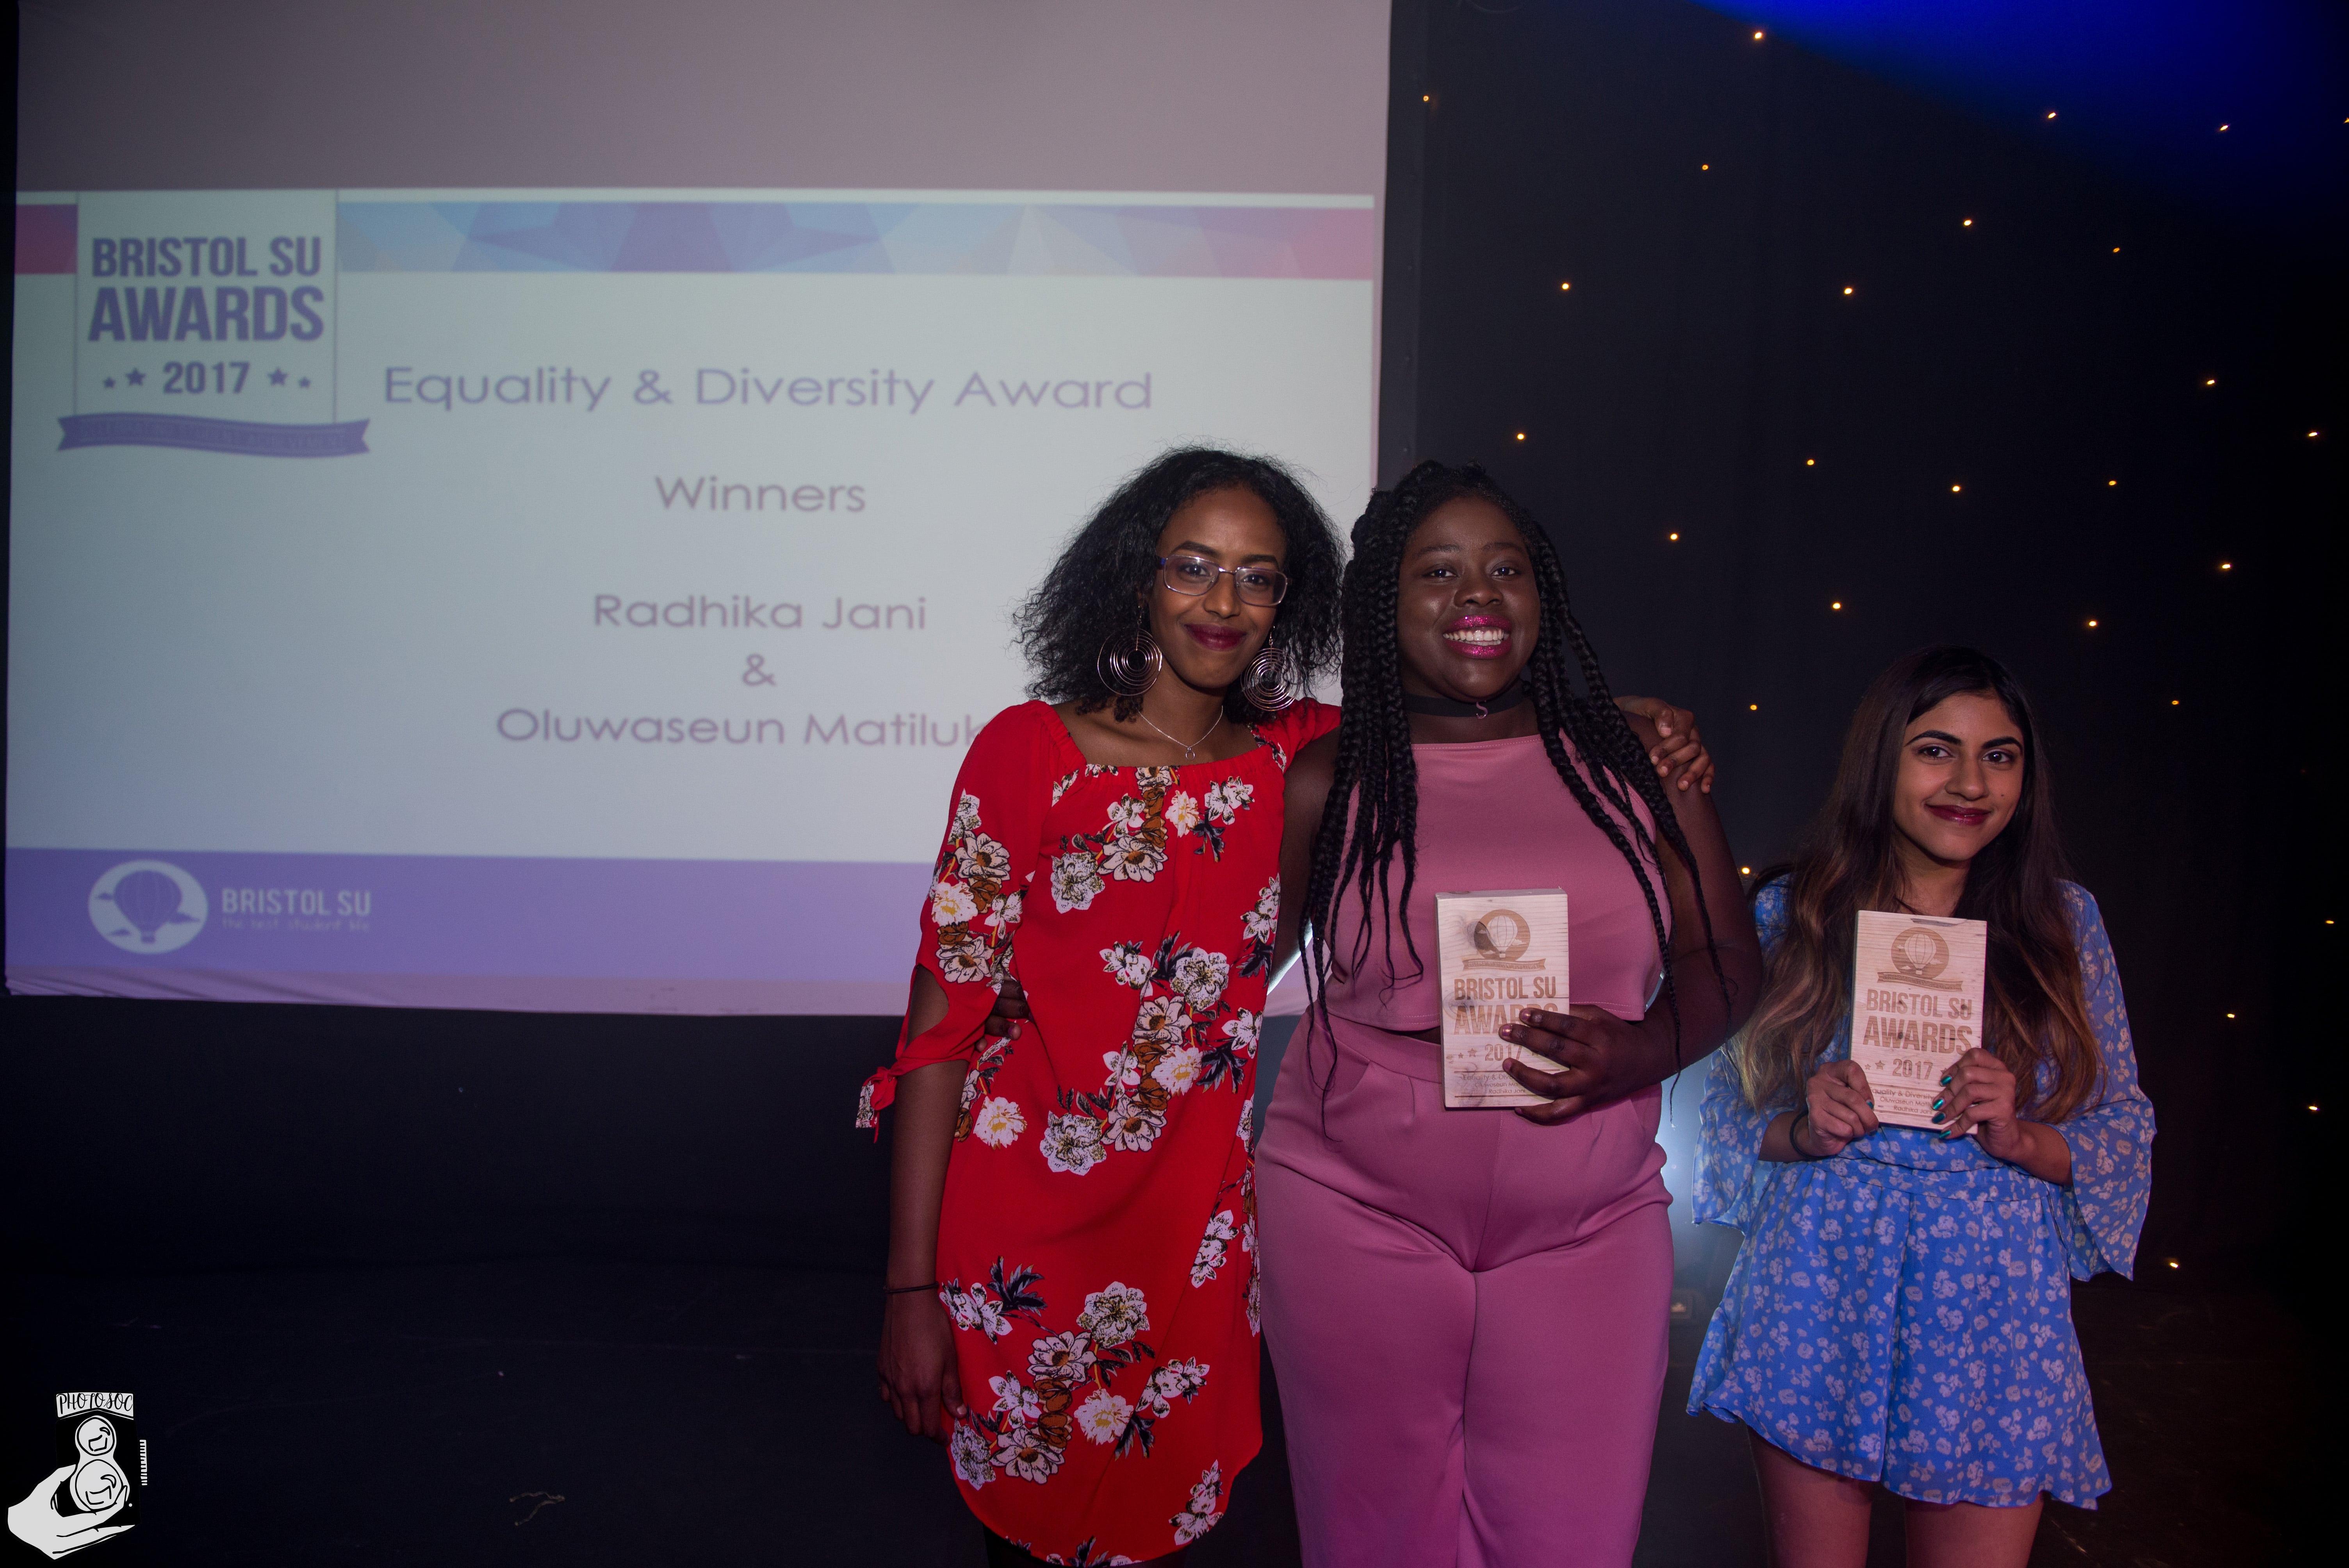 Seun Matiluko and Radhika Jani winning Equality award